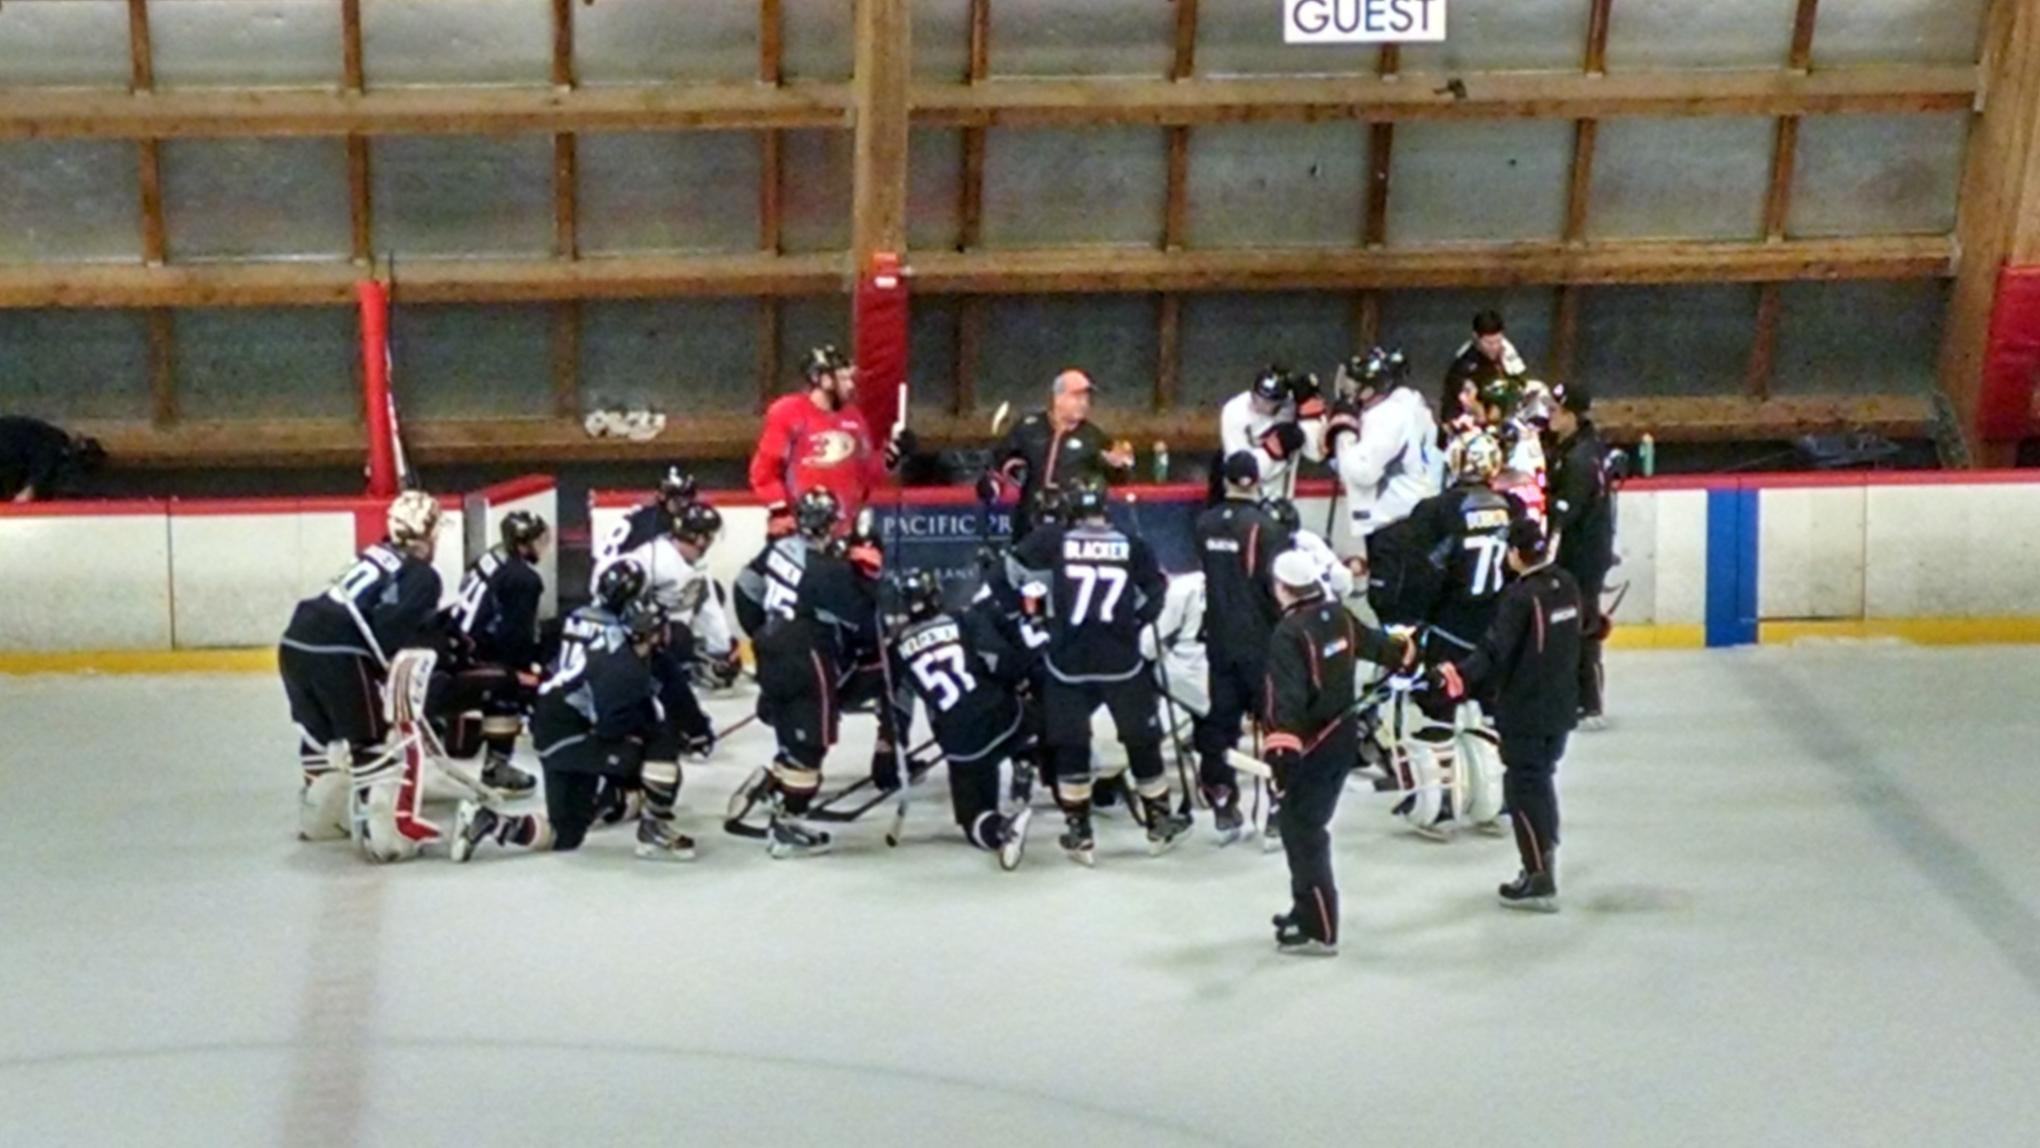 Coach Bruce Boudreau wraps up the final public session of Ducks training camp